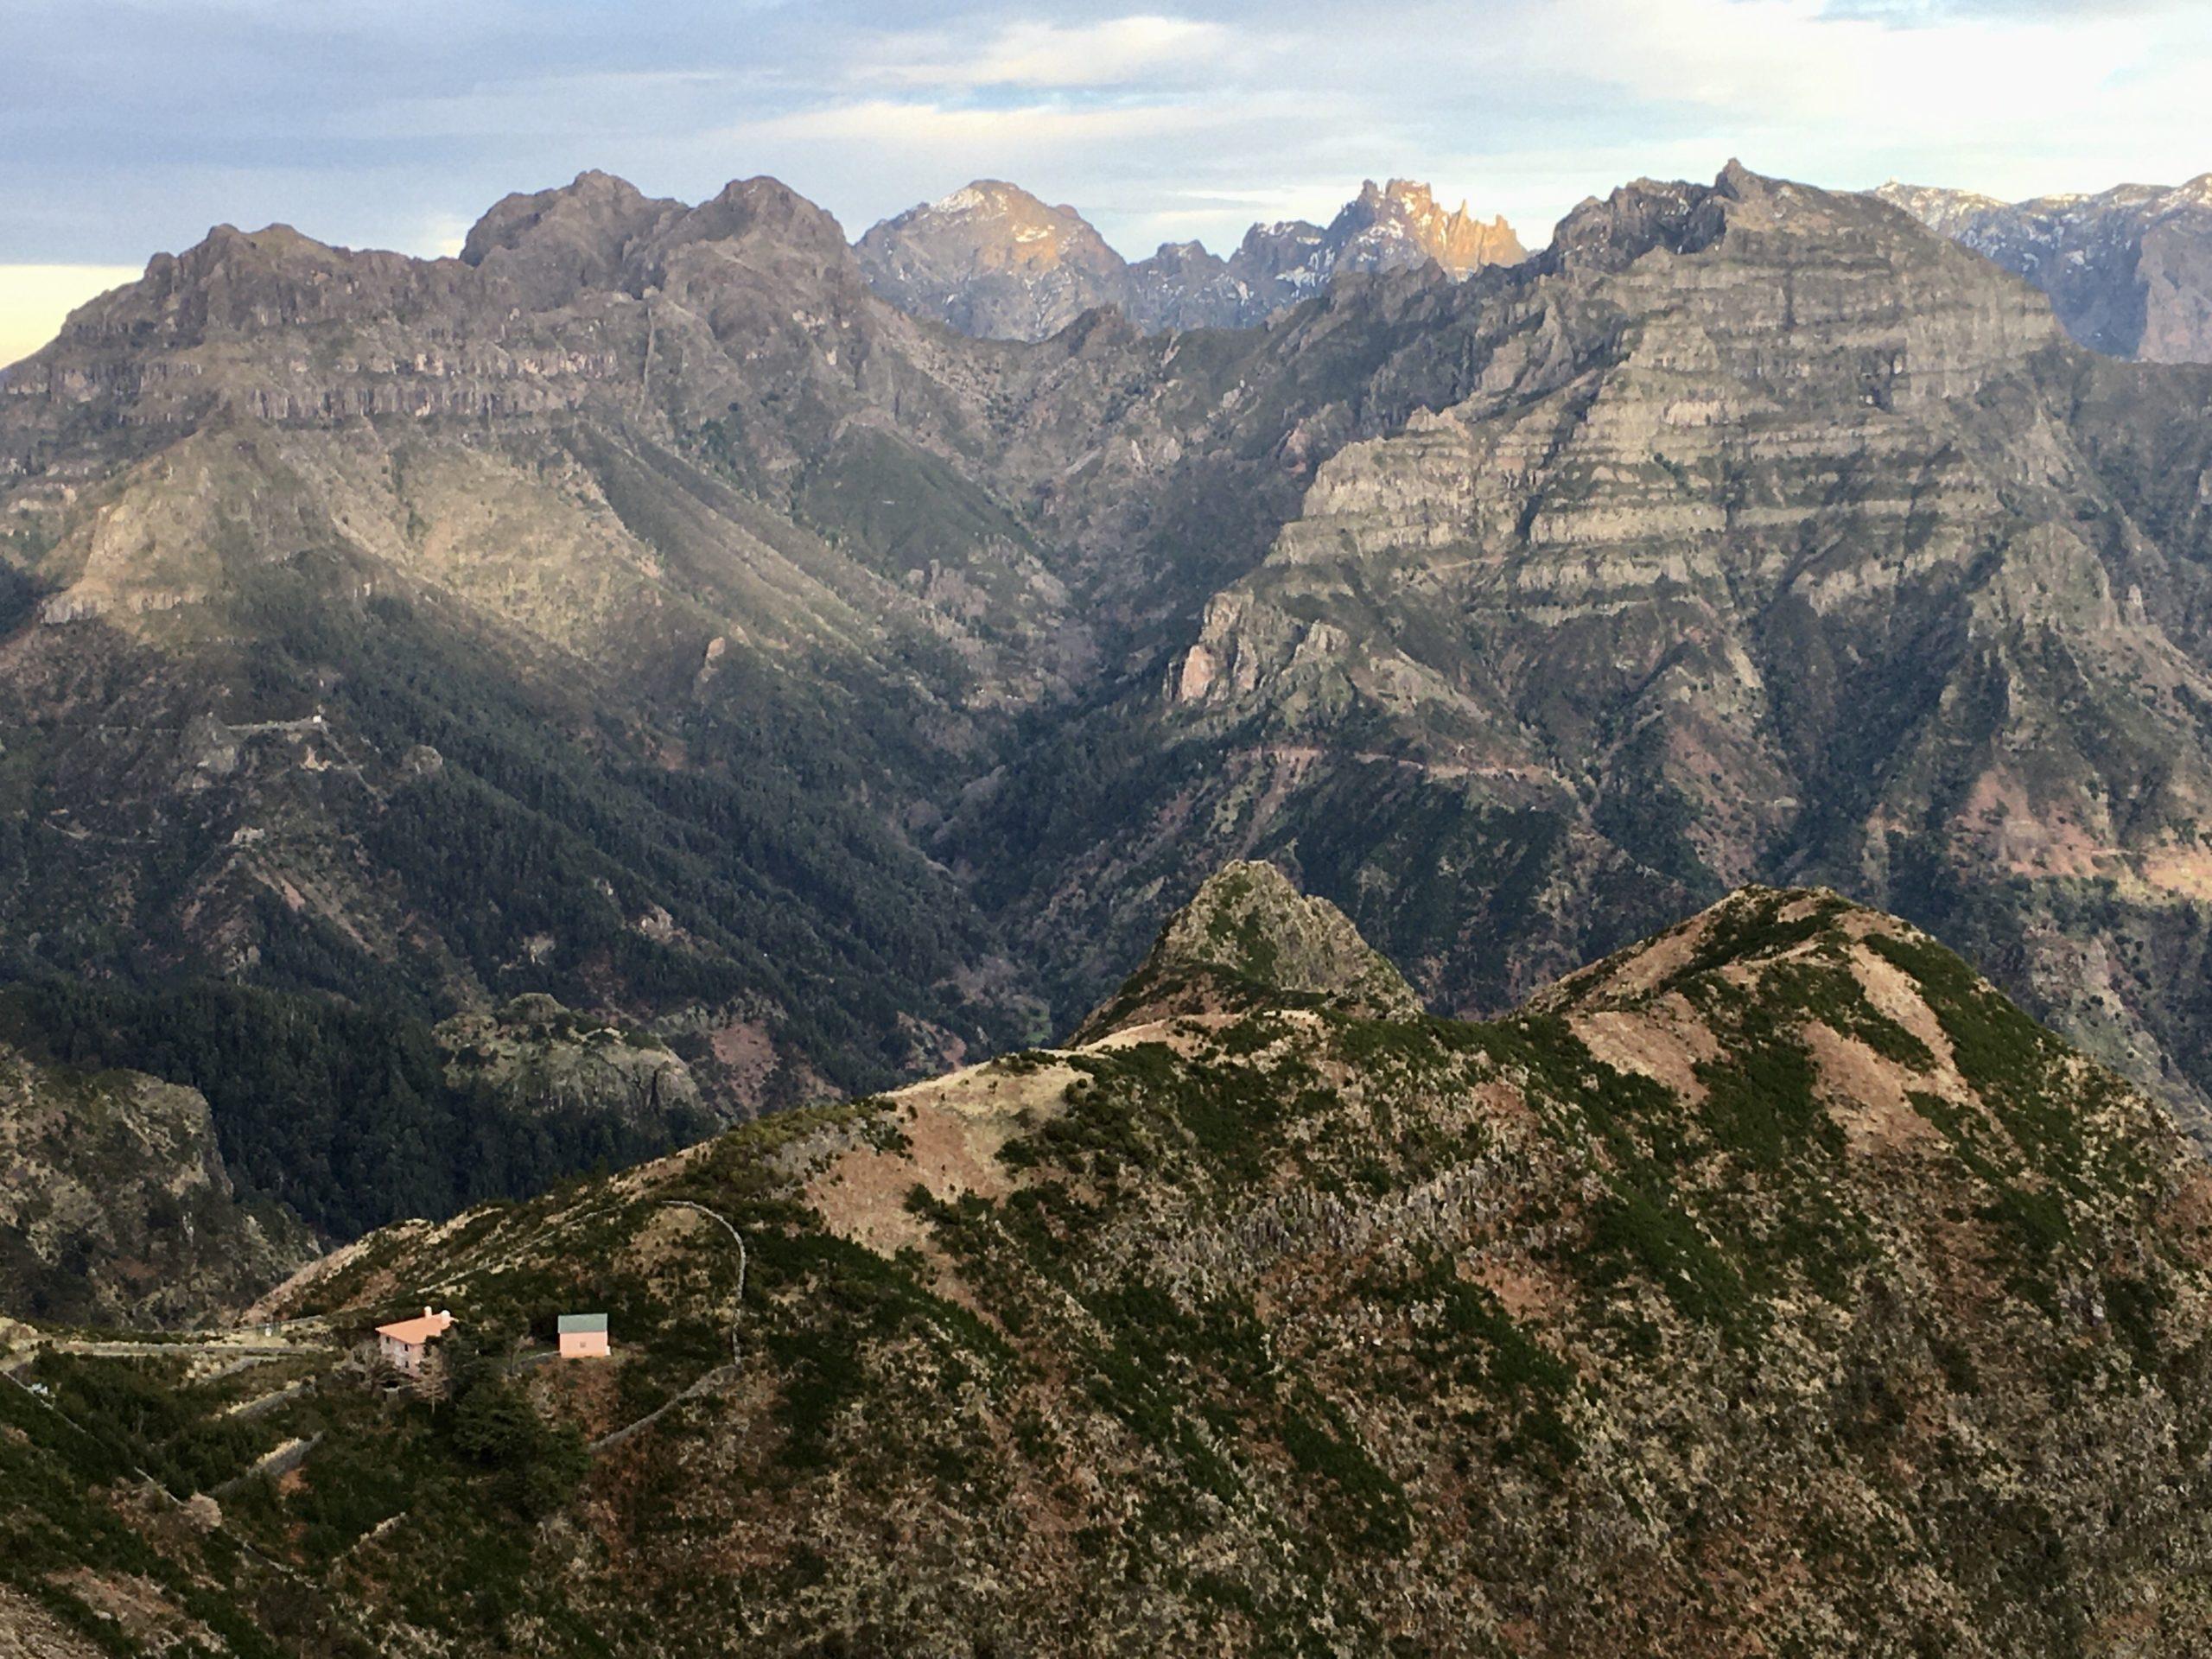 Środek Madery zajmują piękne góry